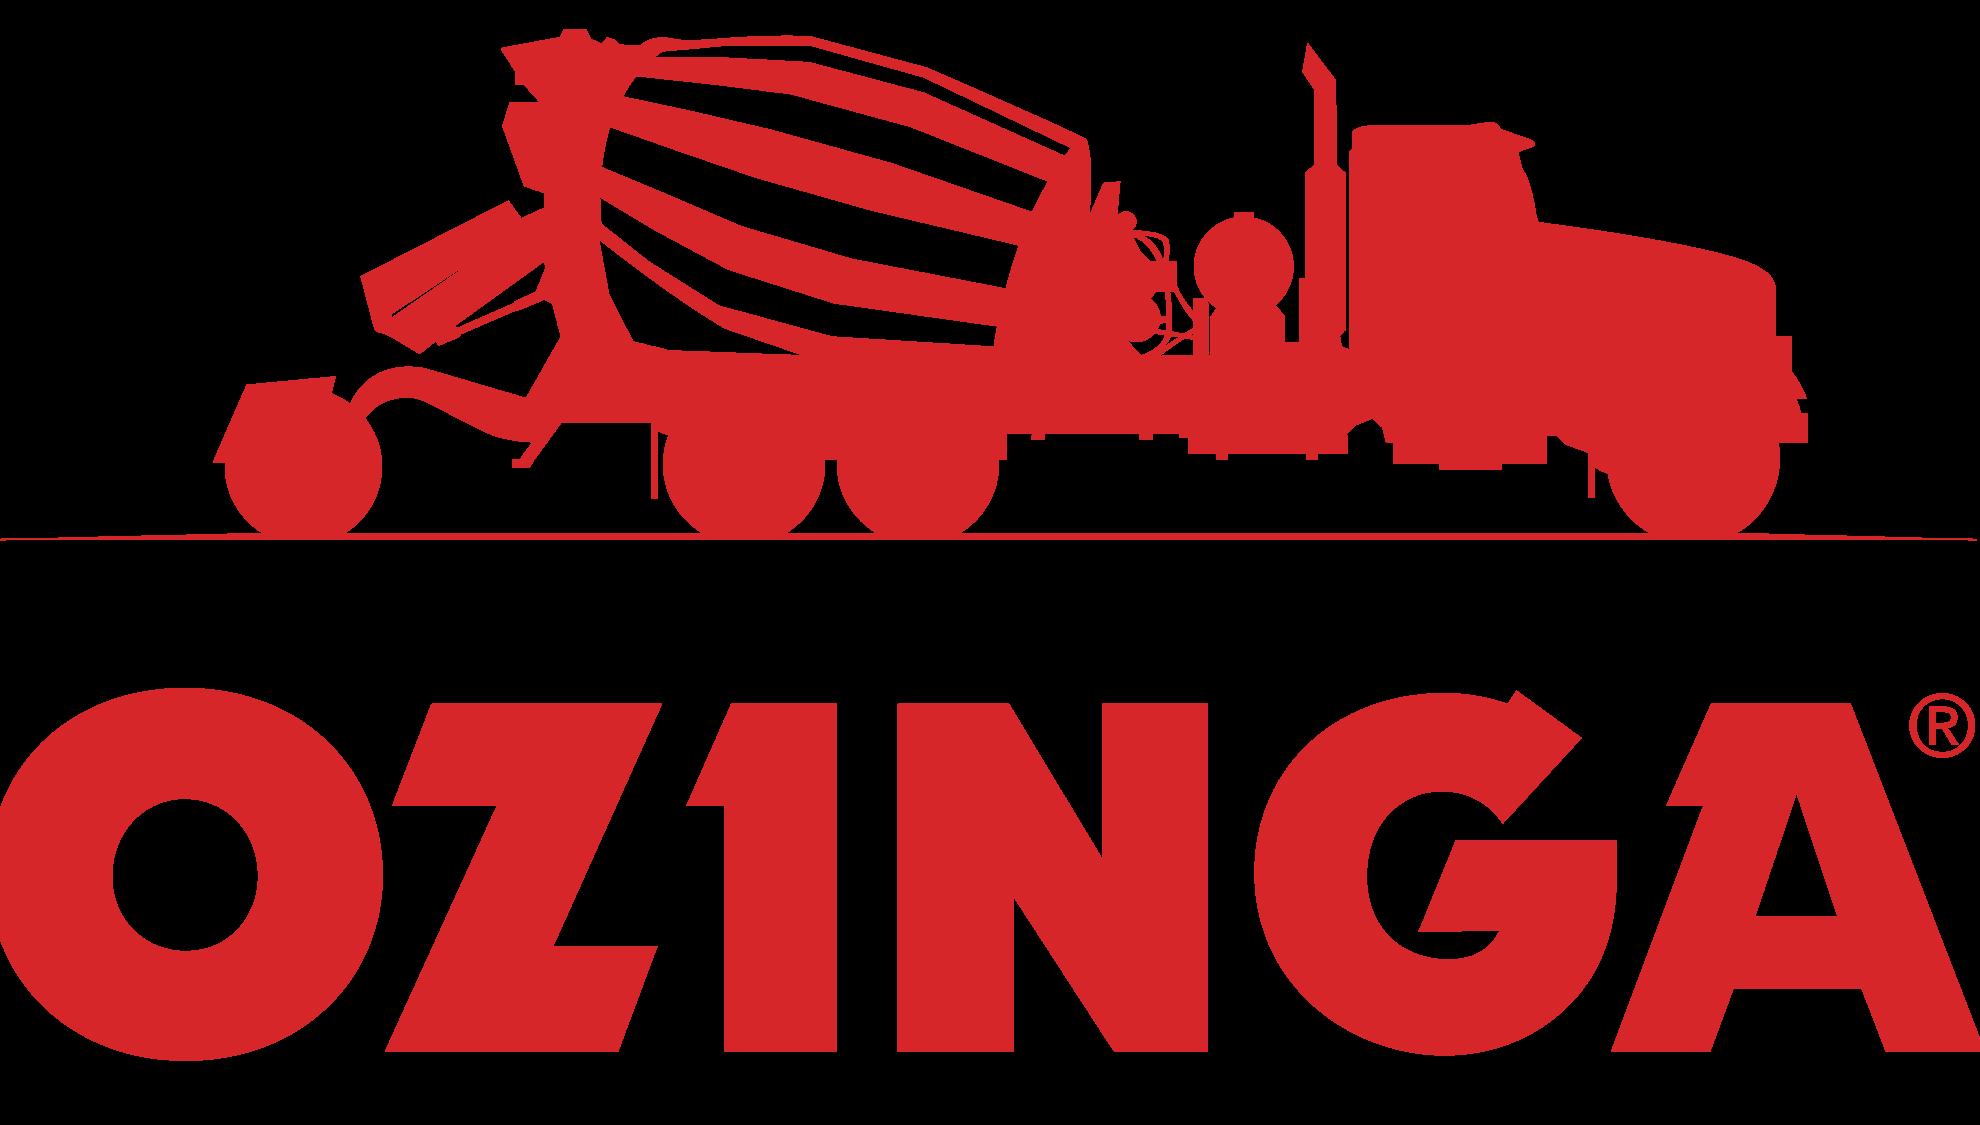 ozinga-logo-e1547489760402.png